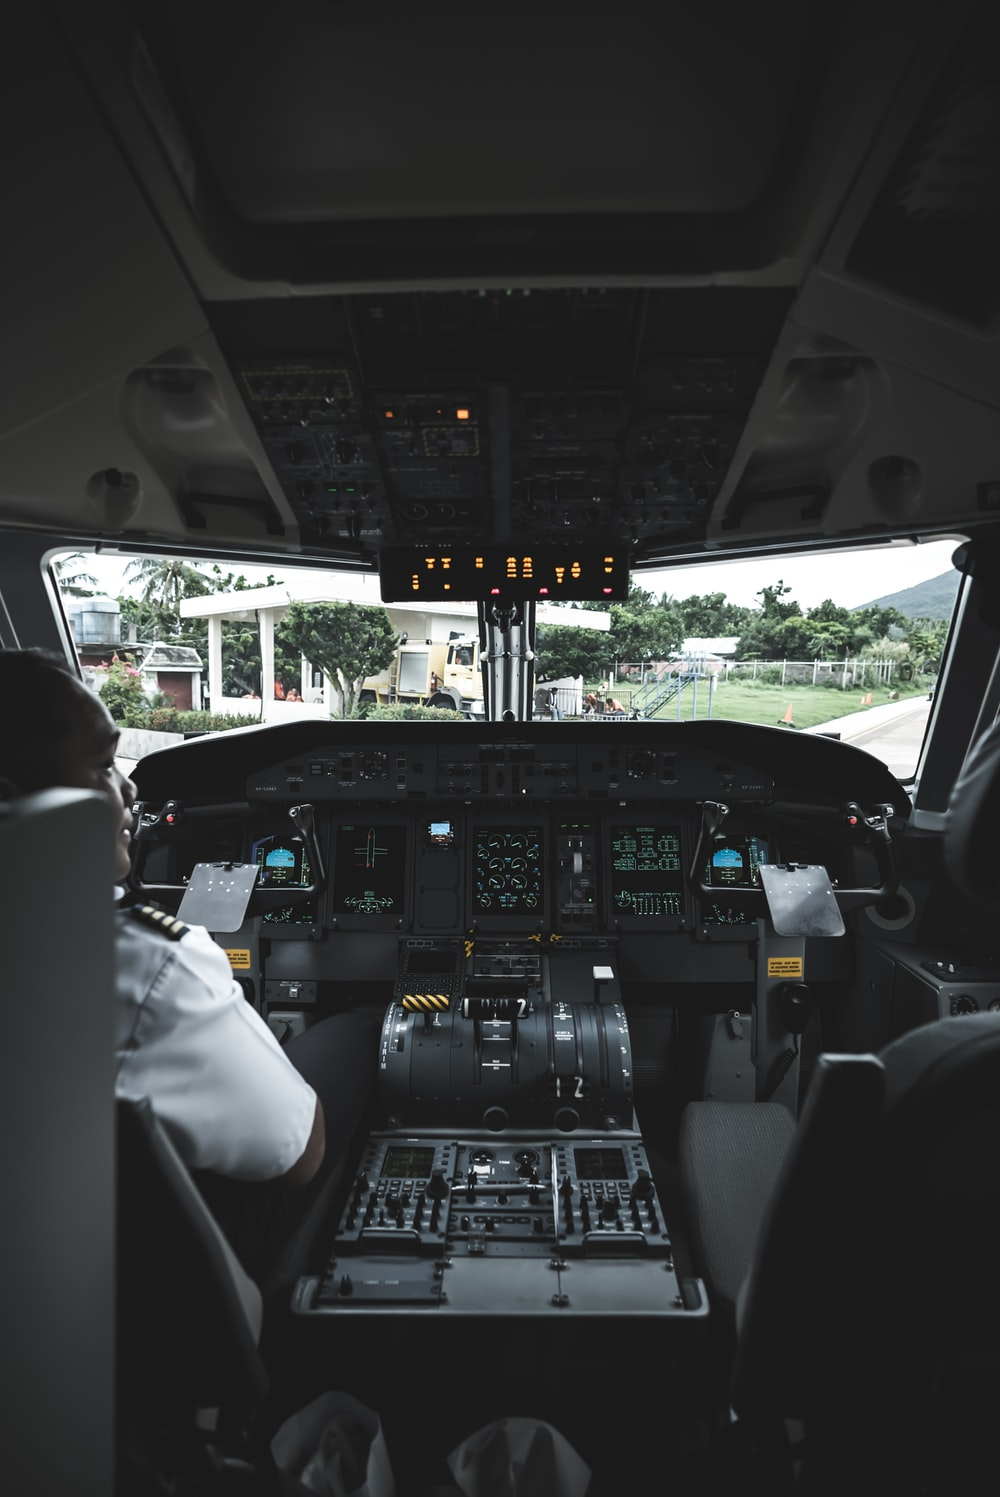 pilot inside operating the aircraft